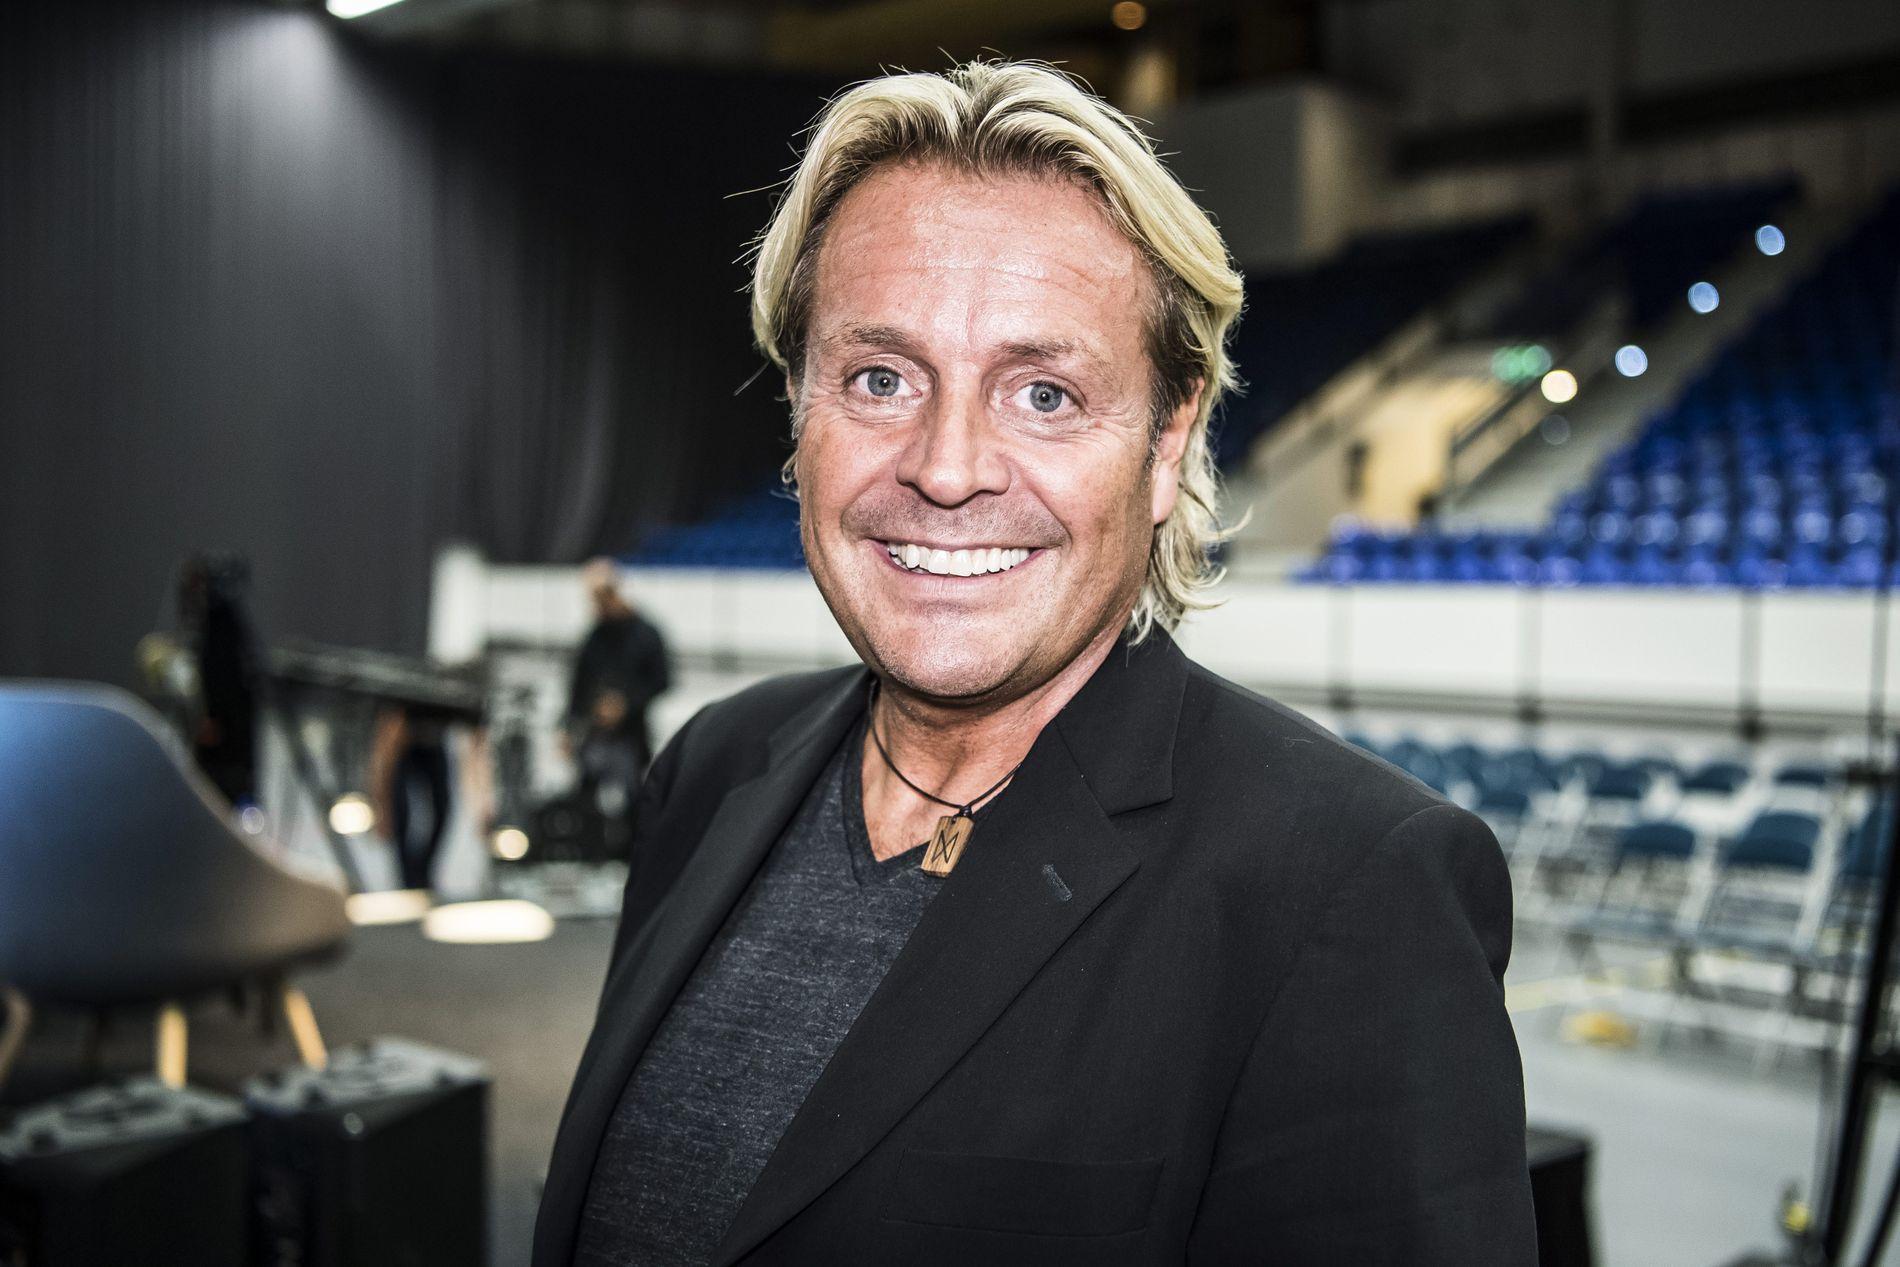 ANMELDT: Runar Søgaard.